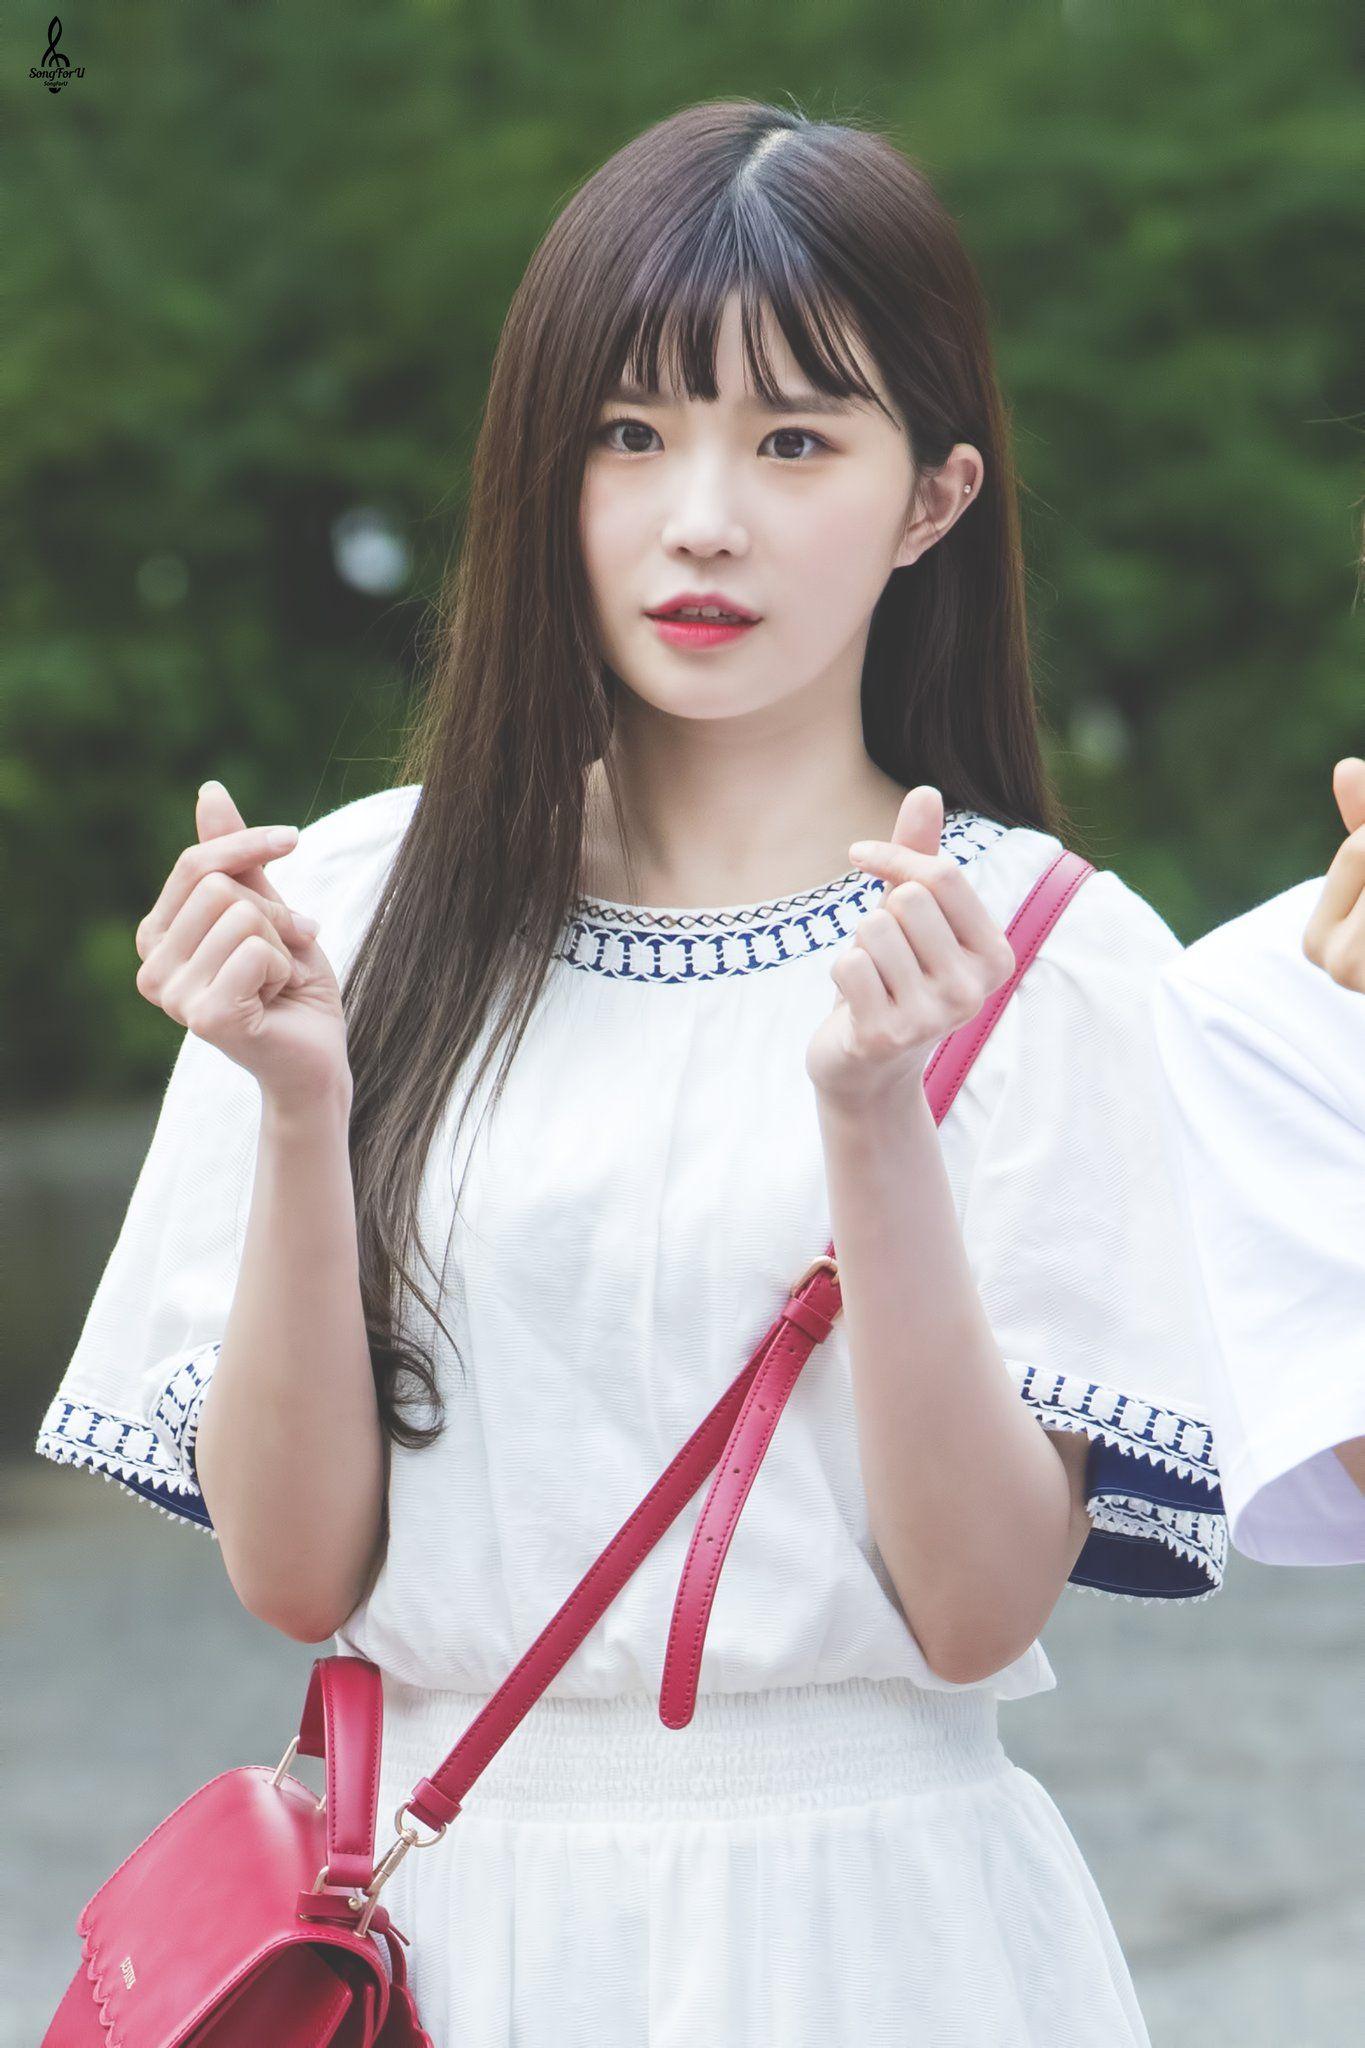 Hayoung fromis_9 하영 프로미스나인 Flower girl dresses, Pop